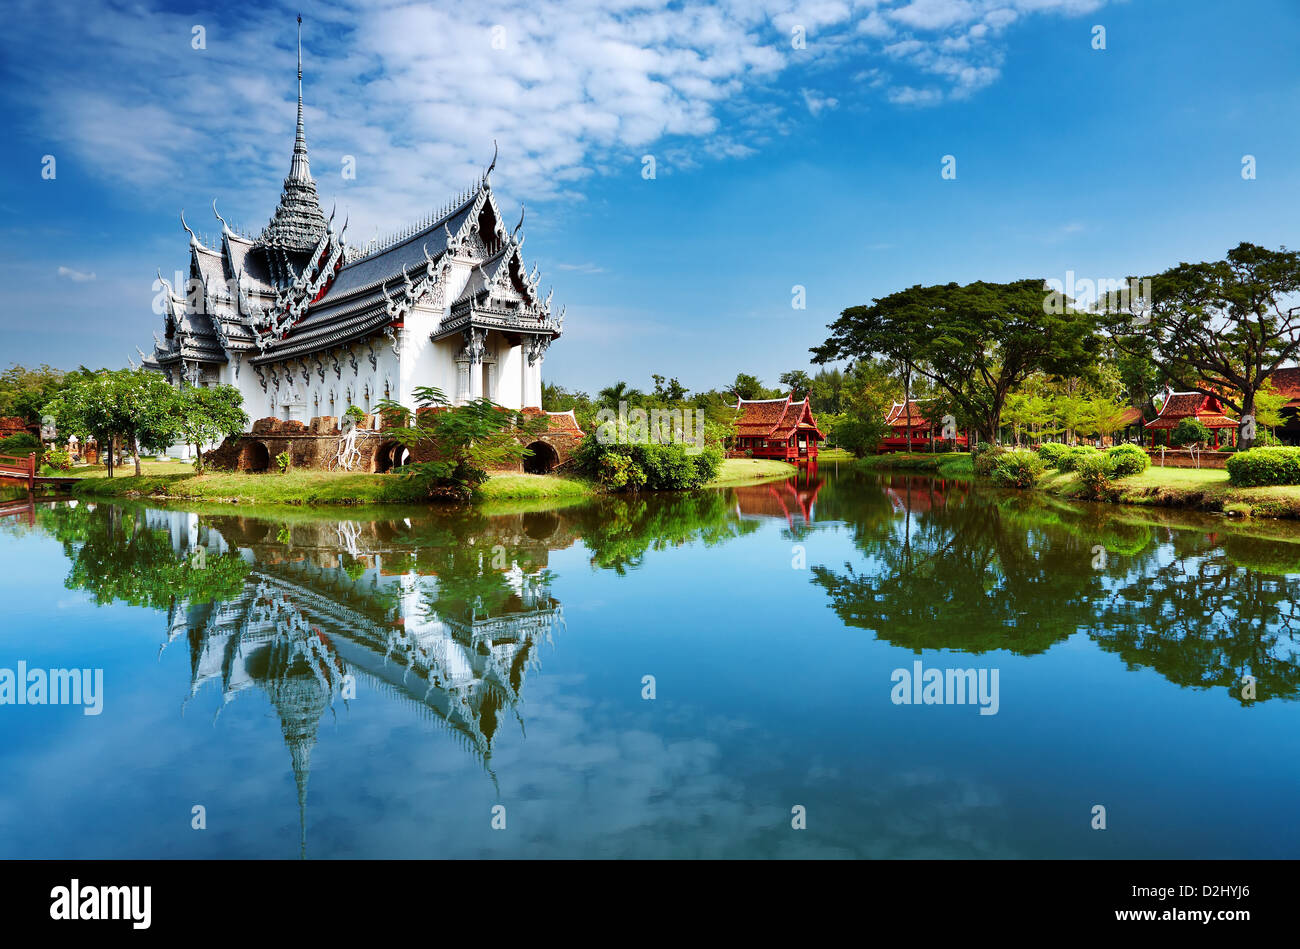 Sanphet Prasat Palace, antigua ciudad, Bangkok, Tailandia Imagen De Stock